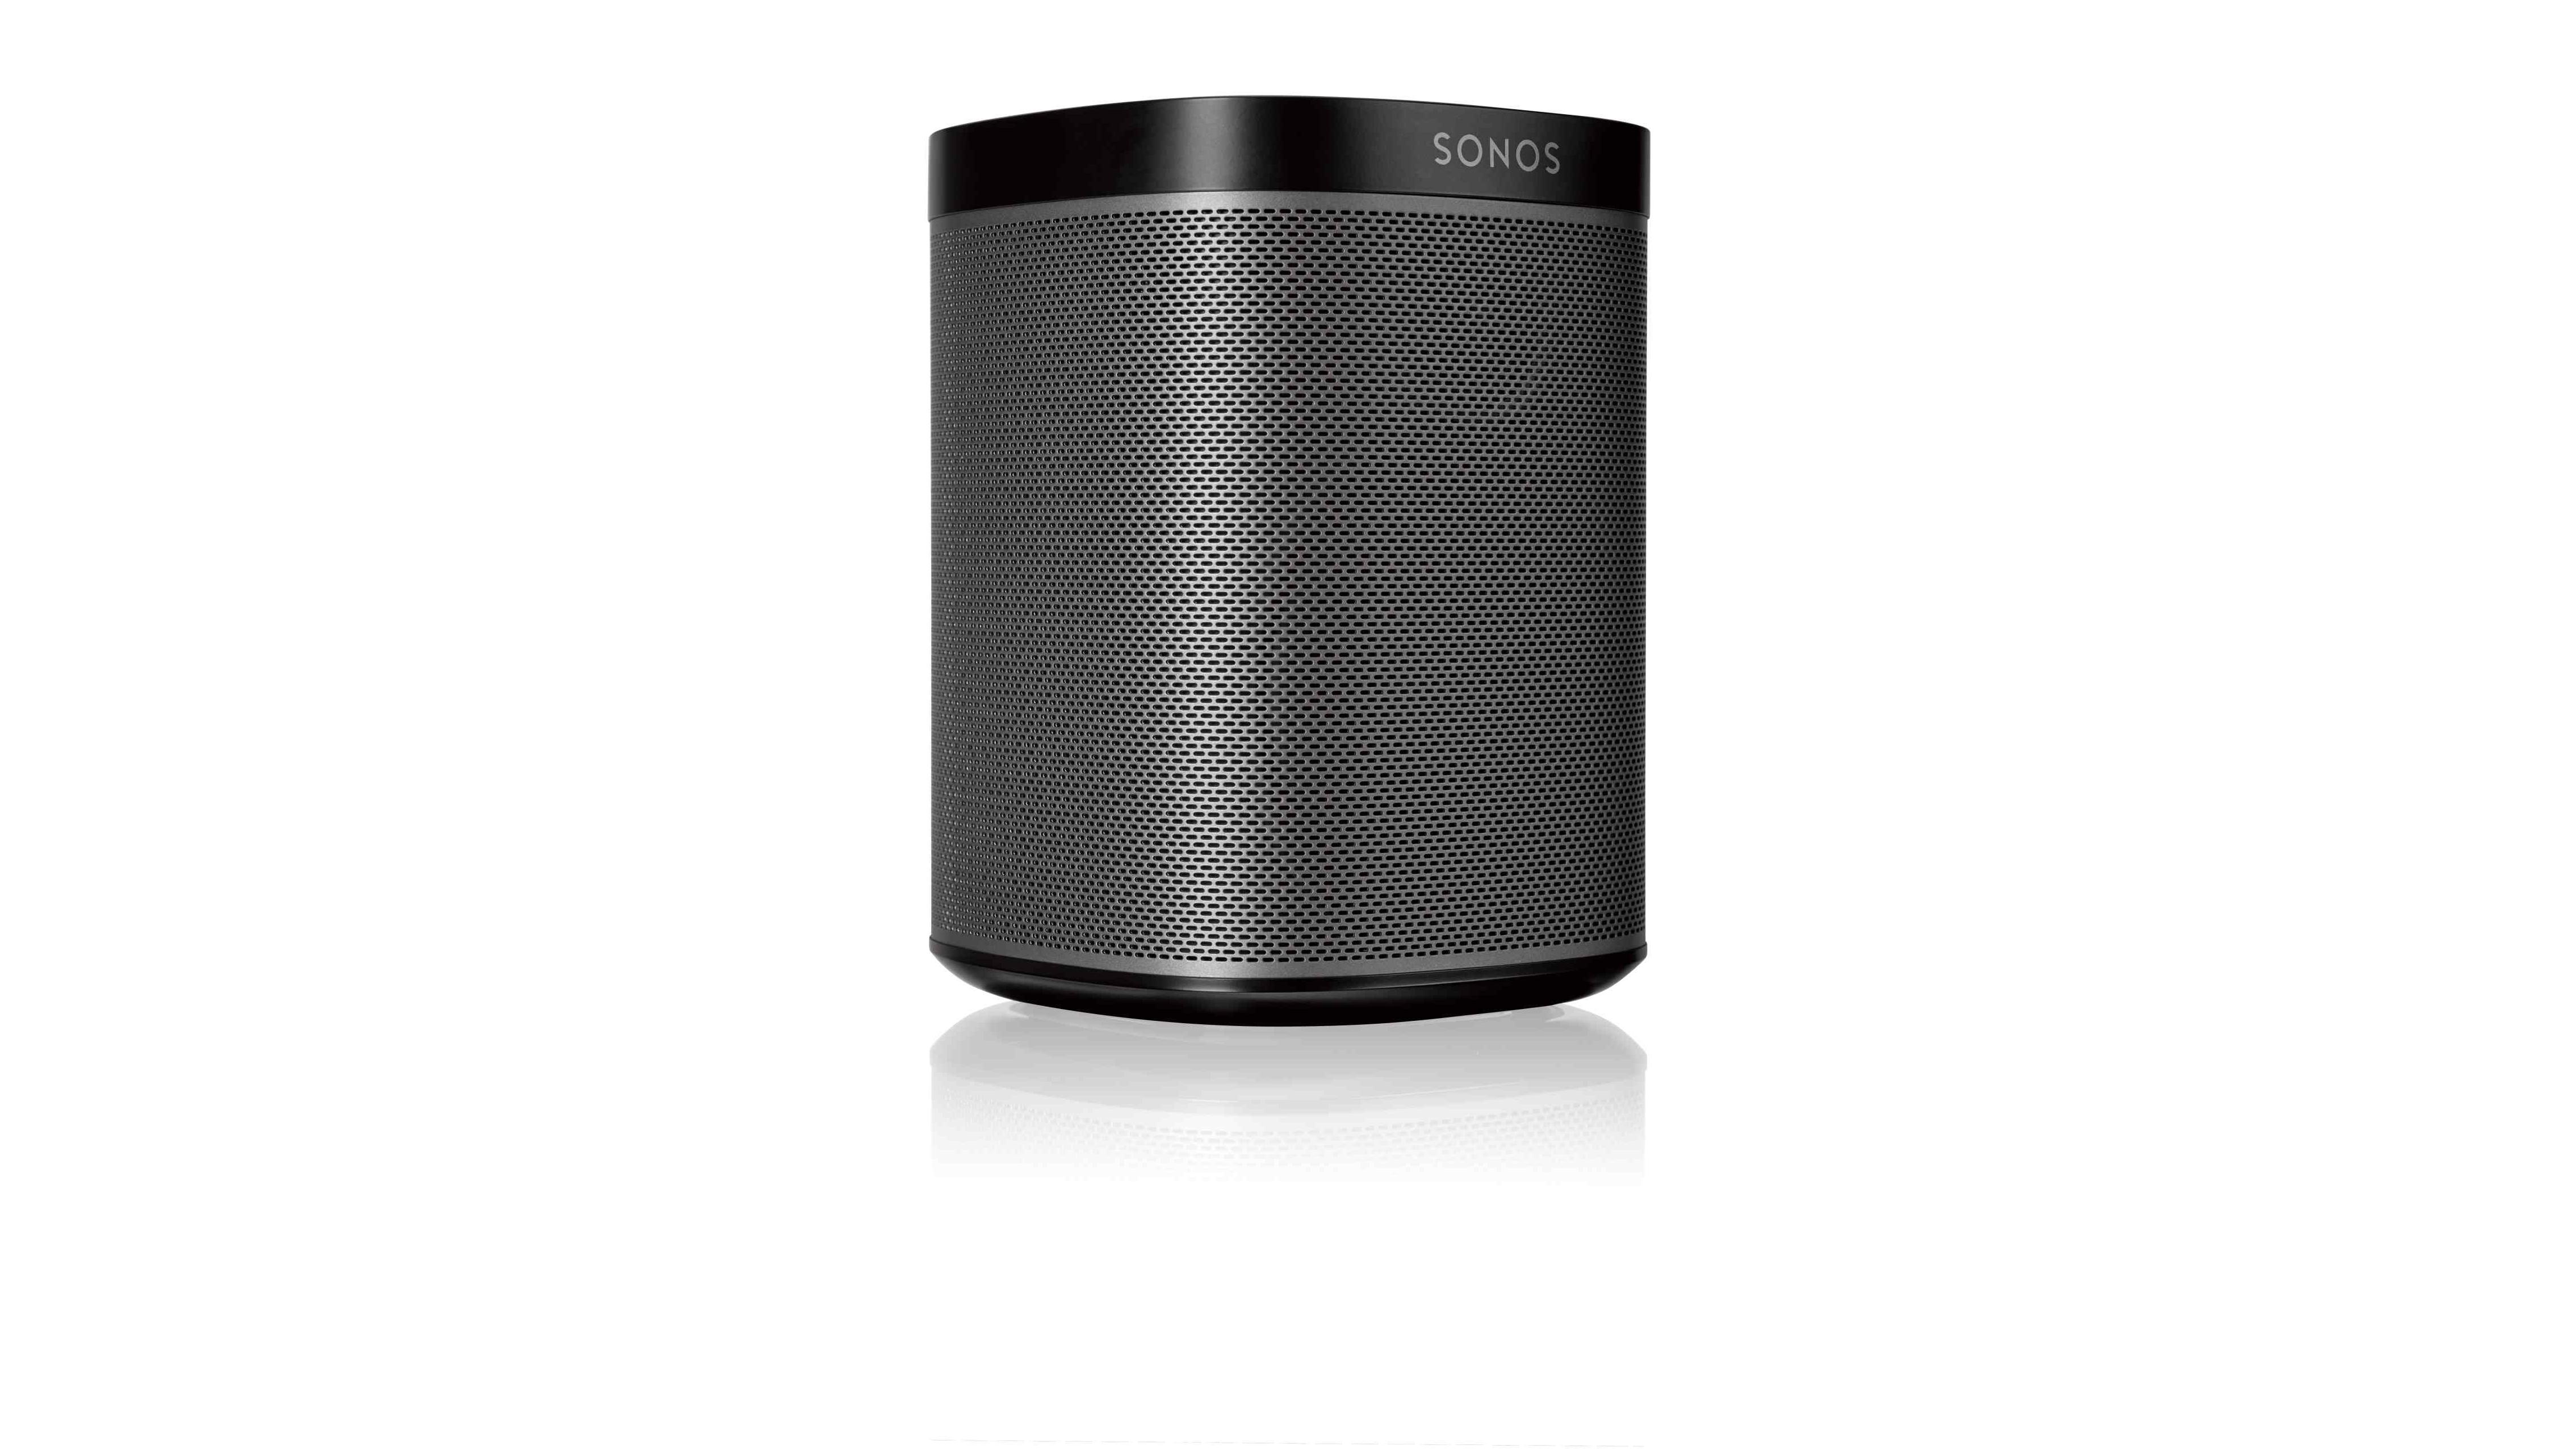 Sonos PLAY:1 Wireless Hi Fi Music System - Black